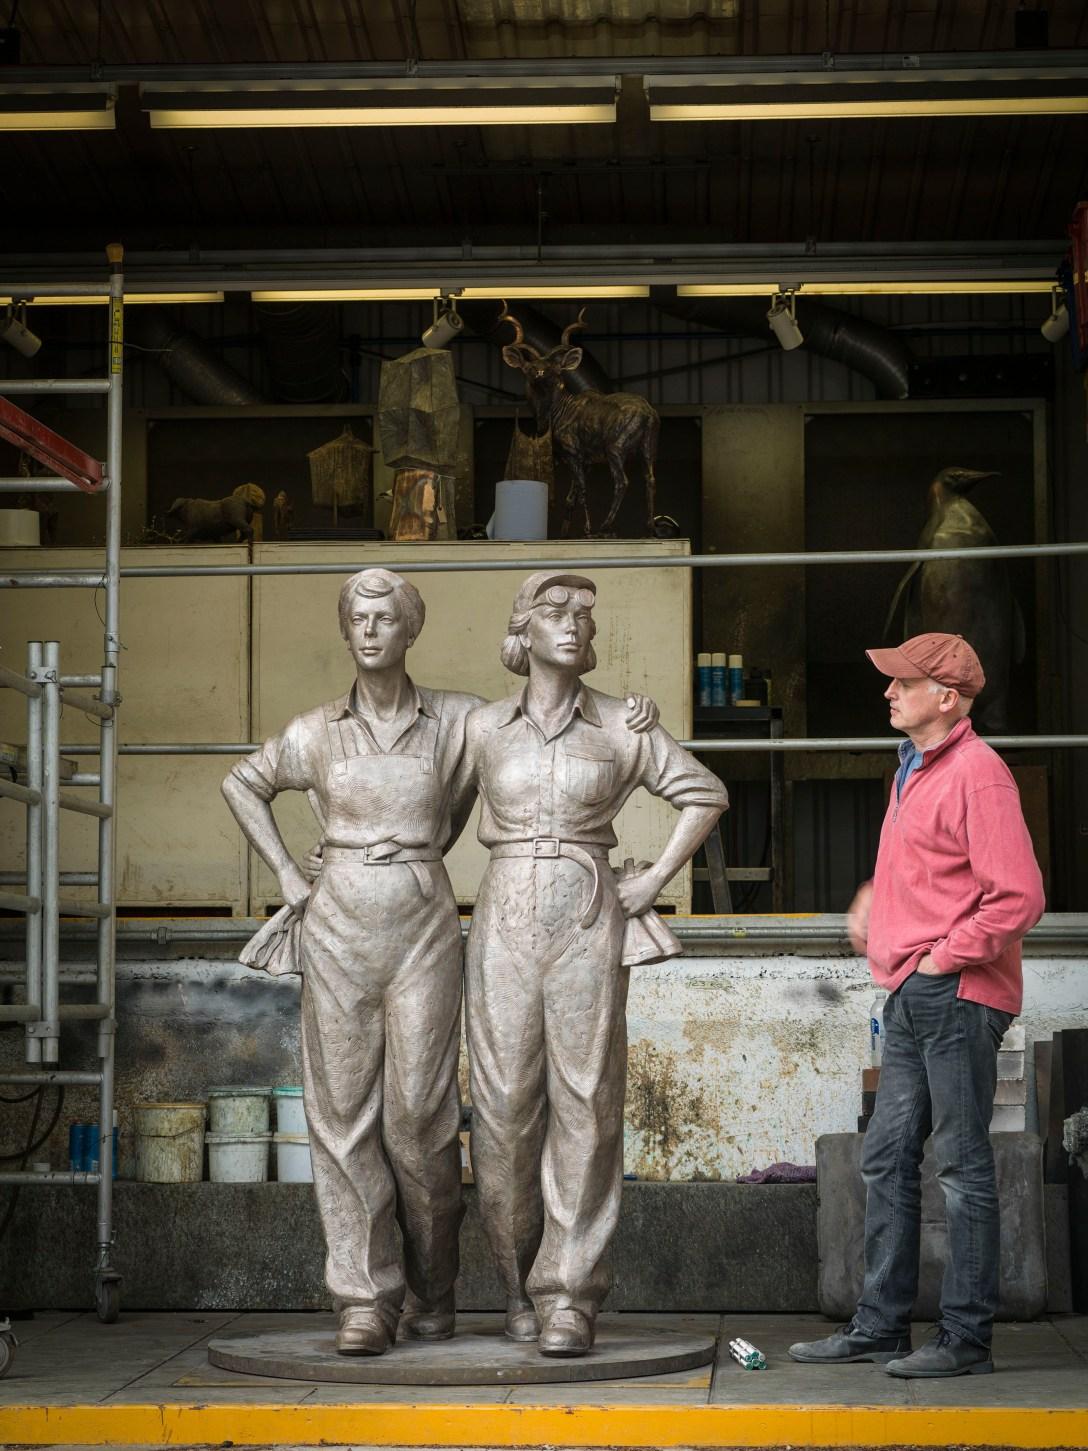 'Bronze' 'sculpture' by Martin Jennings, 'cast' at Pangolin Editions